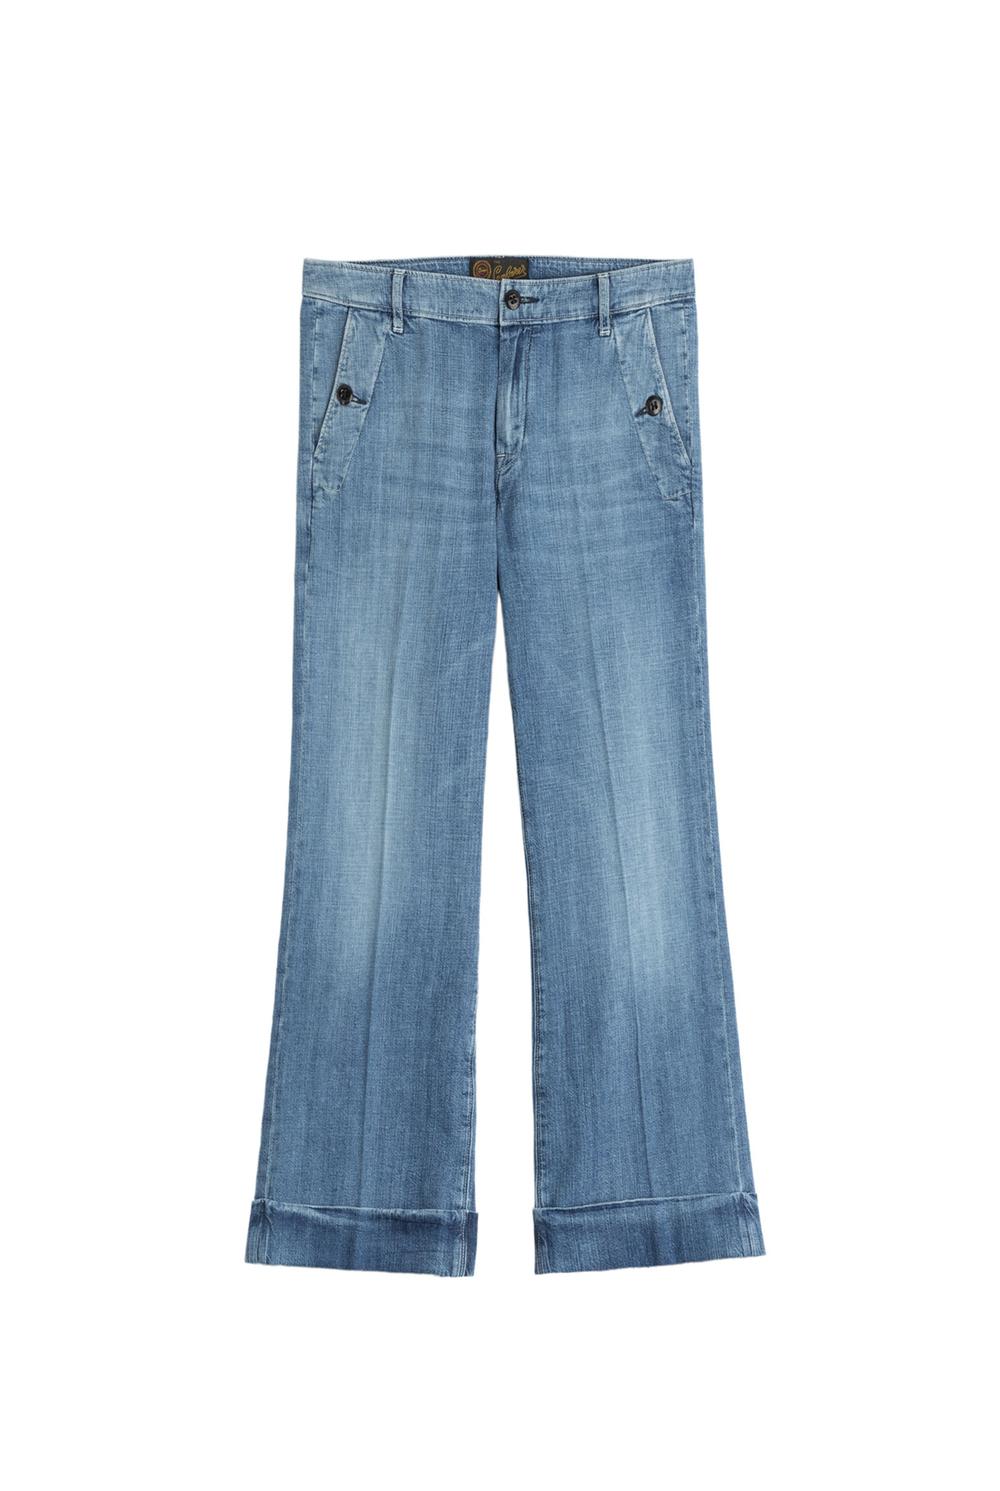 02-spring-denim-trends-culottes-04.jpg